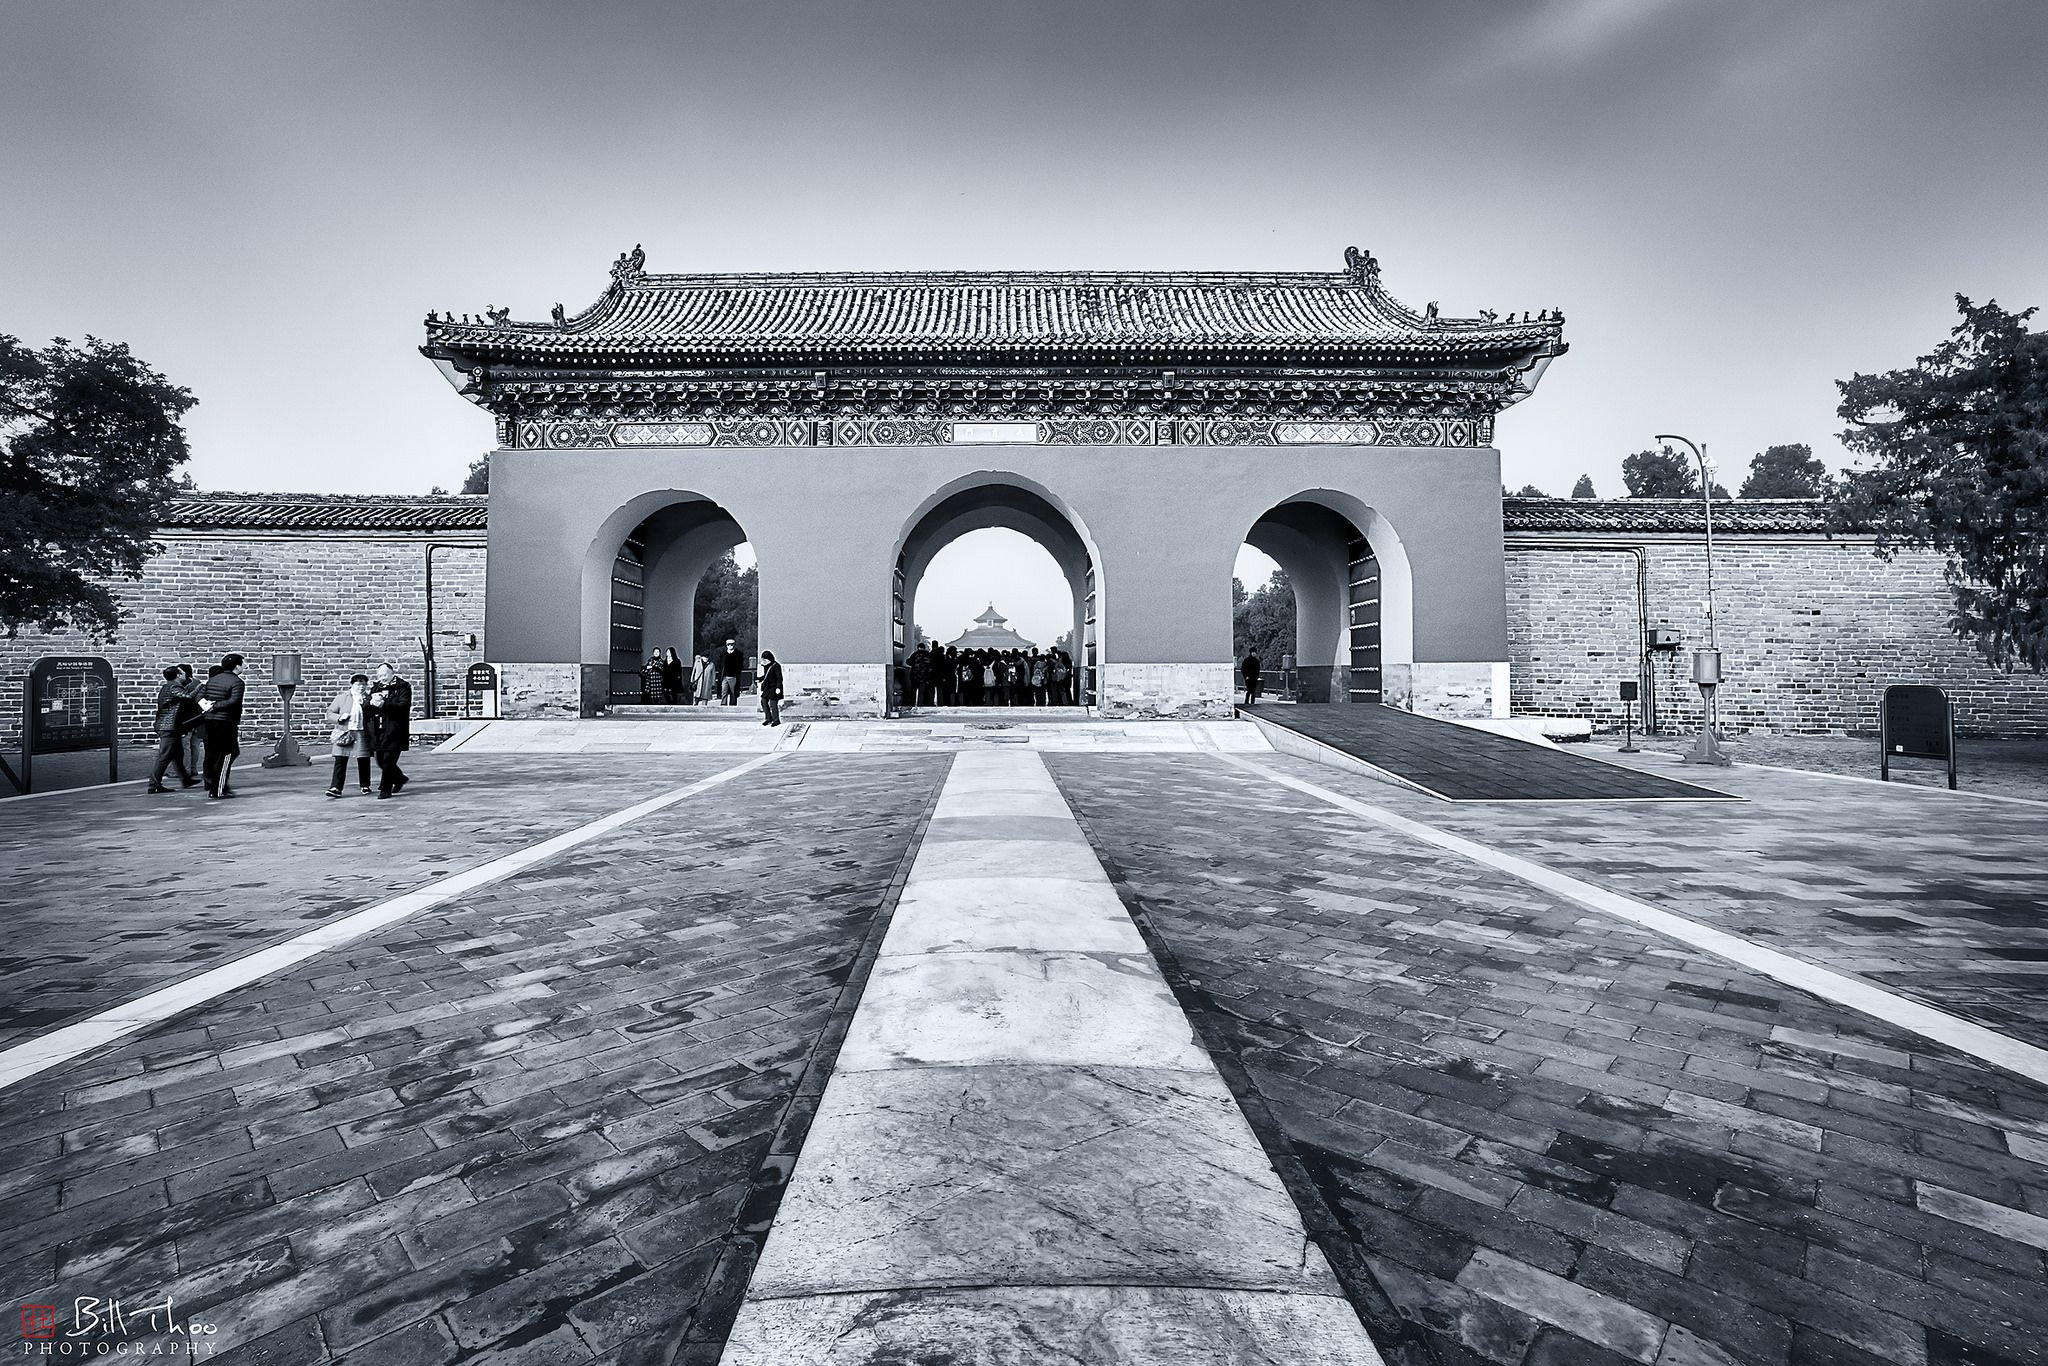 https://flic.kr/p/STiuUV   Temple of Heaven   Temple of Heaven, Beijing, China, November 2016.